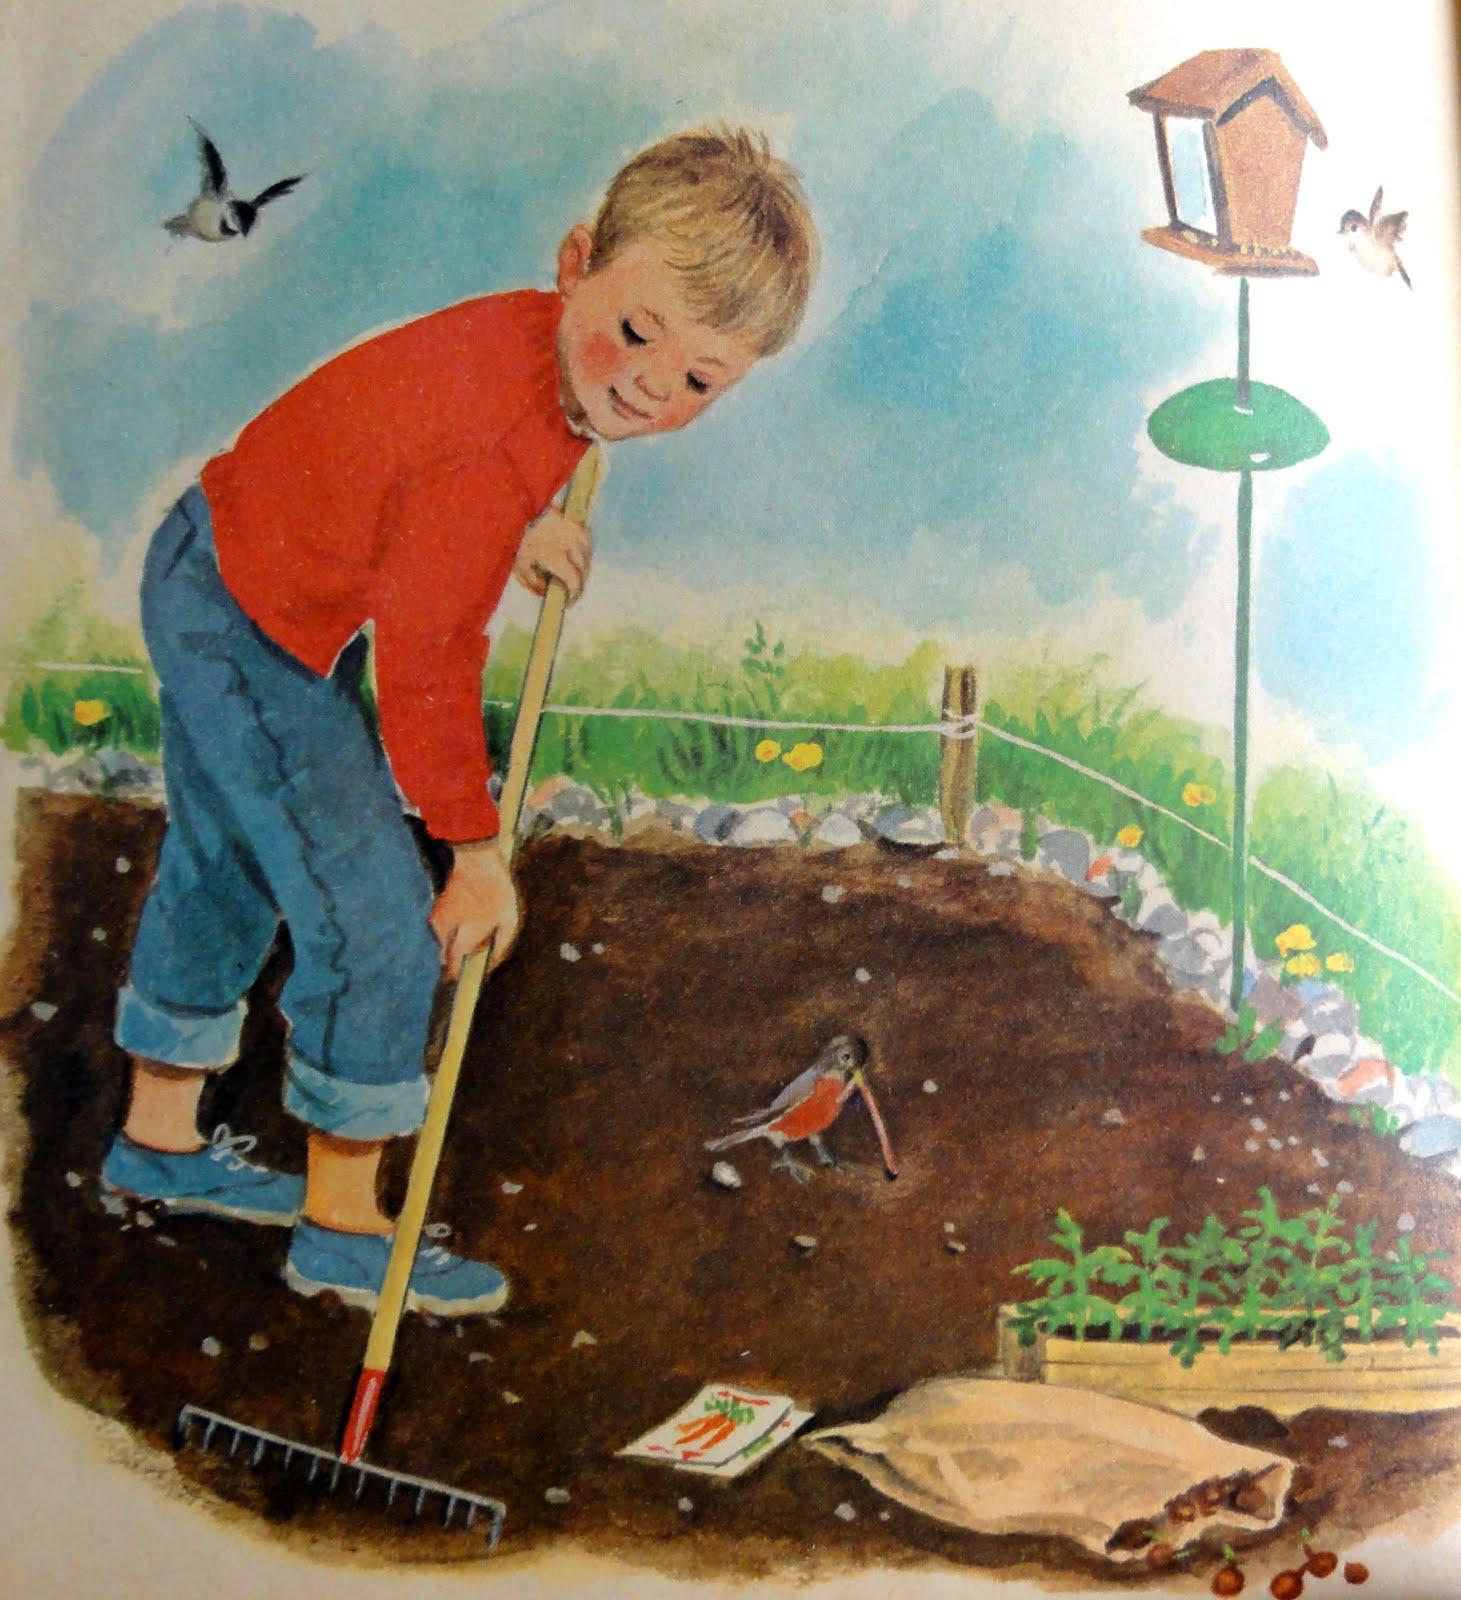 It's Gardening Time